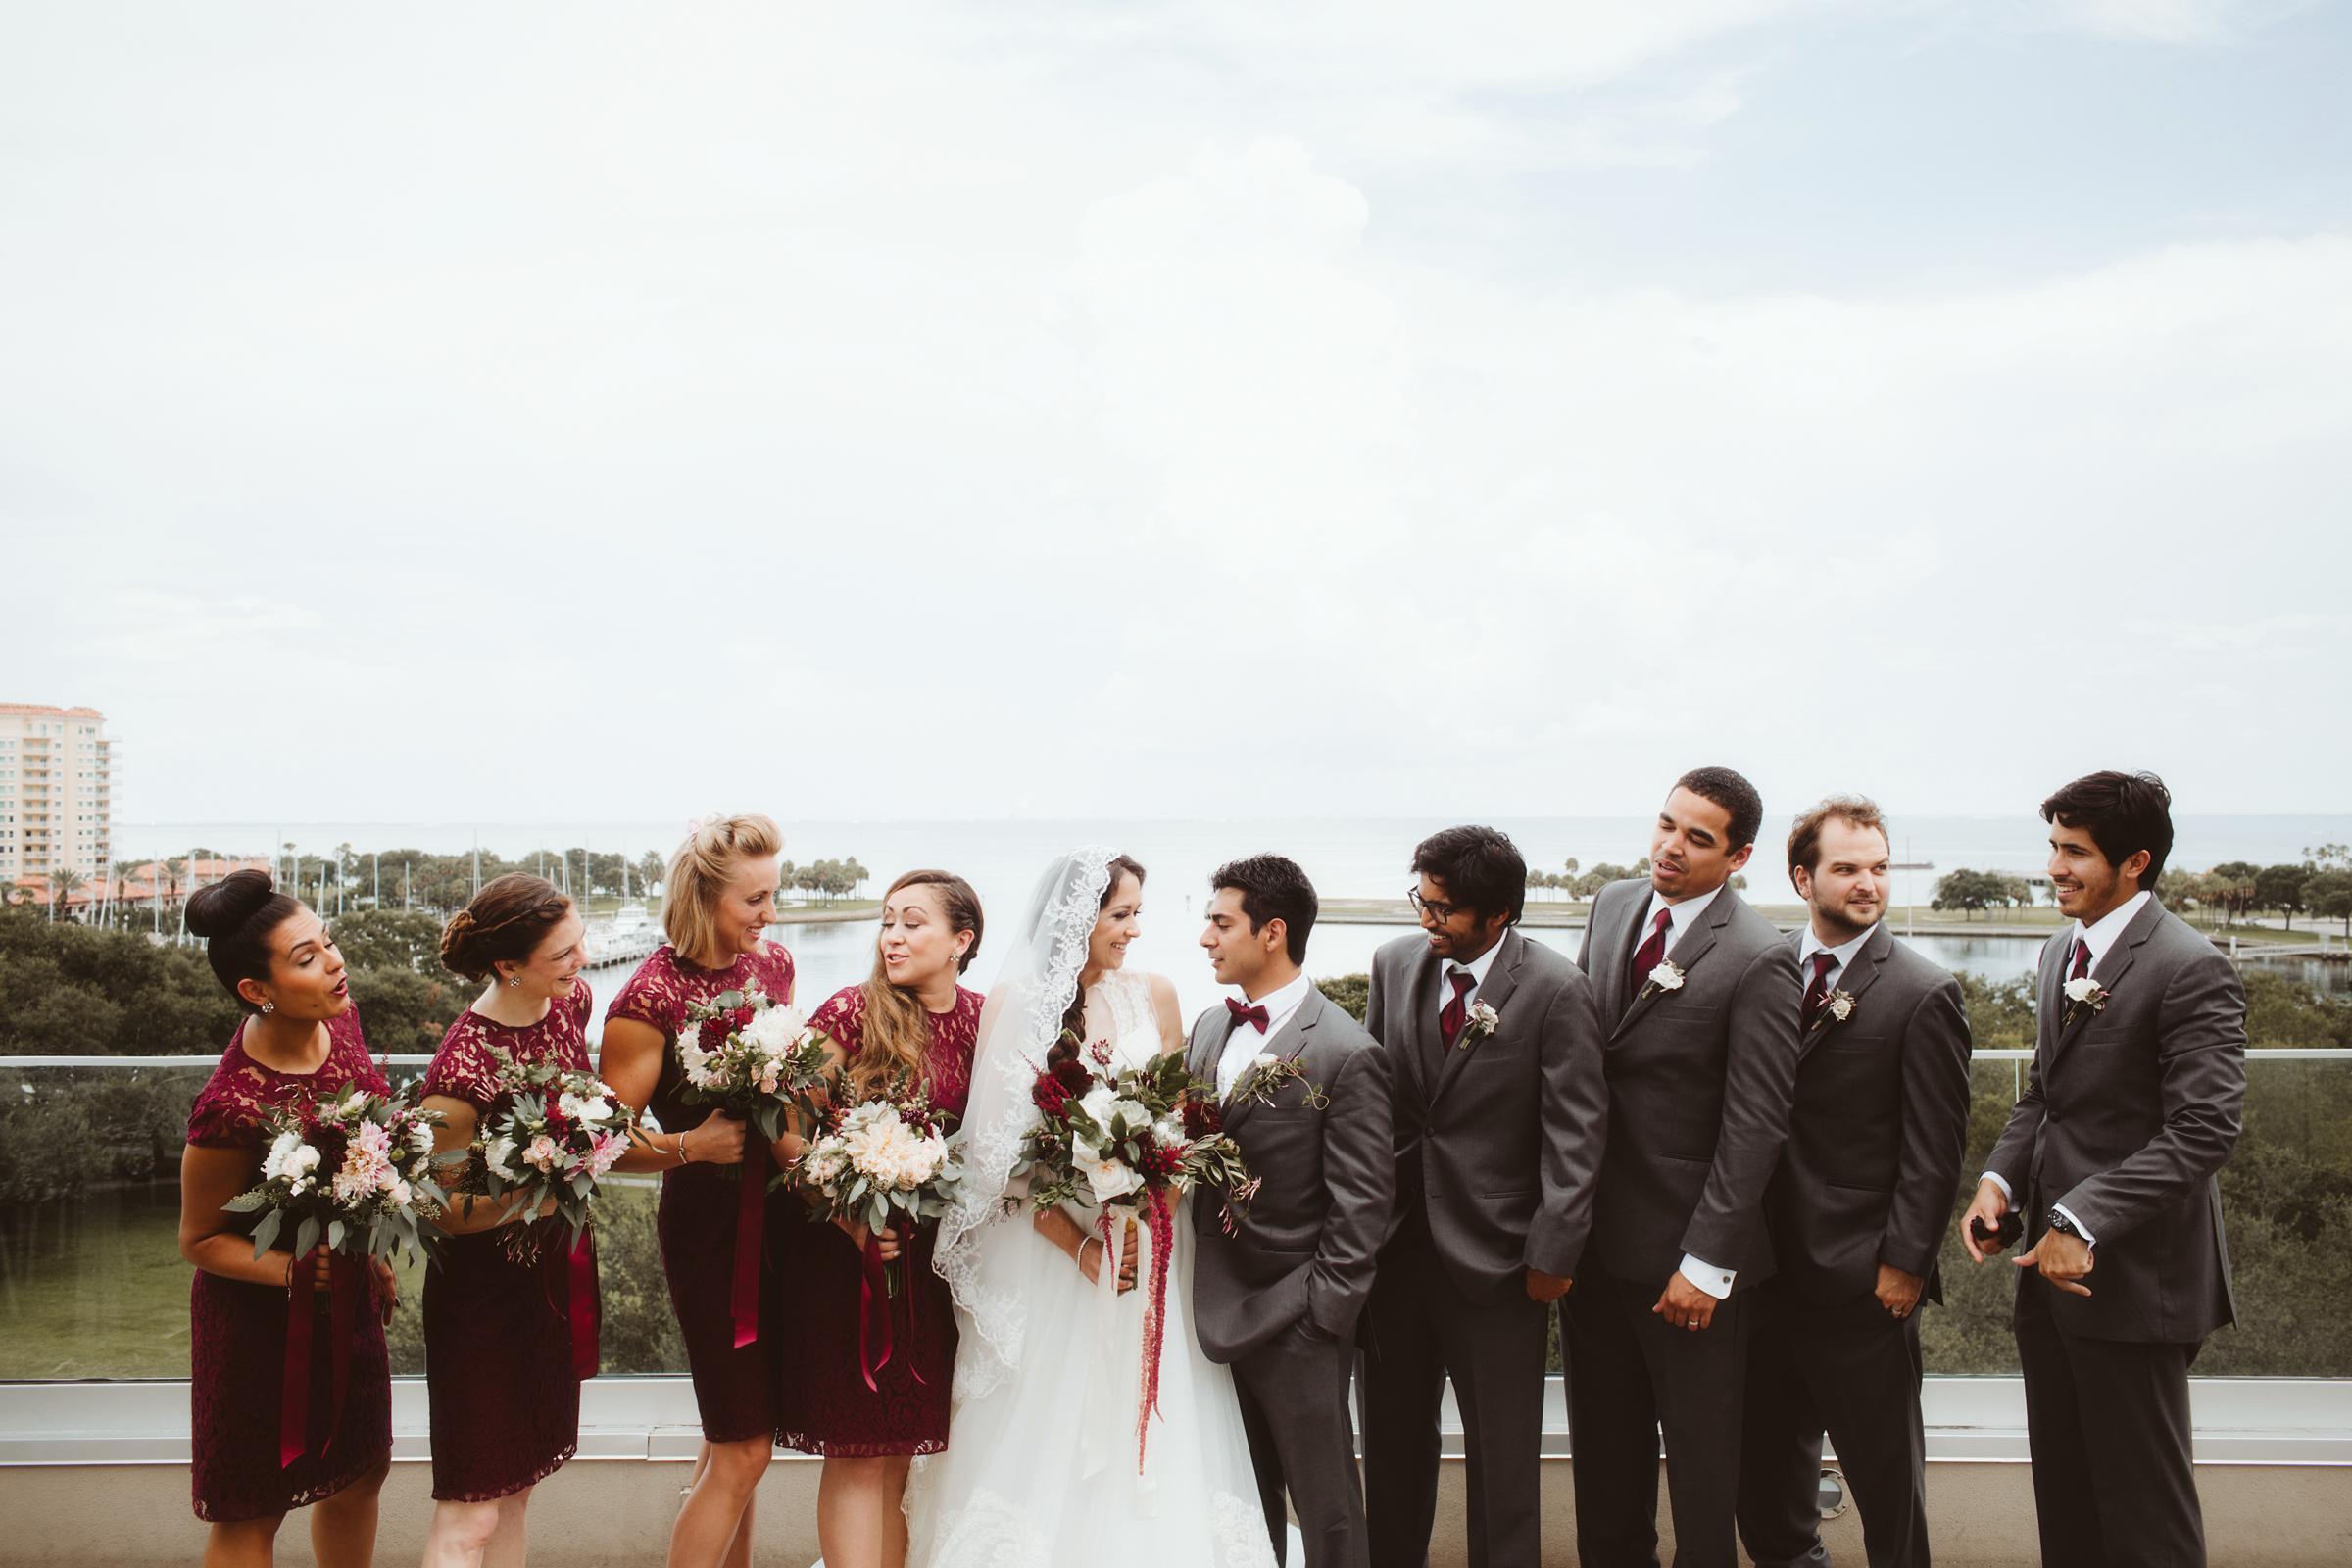 wedding day | MFA St Pete | Vanessa Boy Photography | vanessaboy.com-172.com |final.jpg